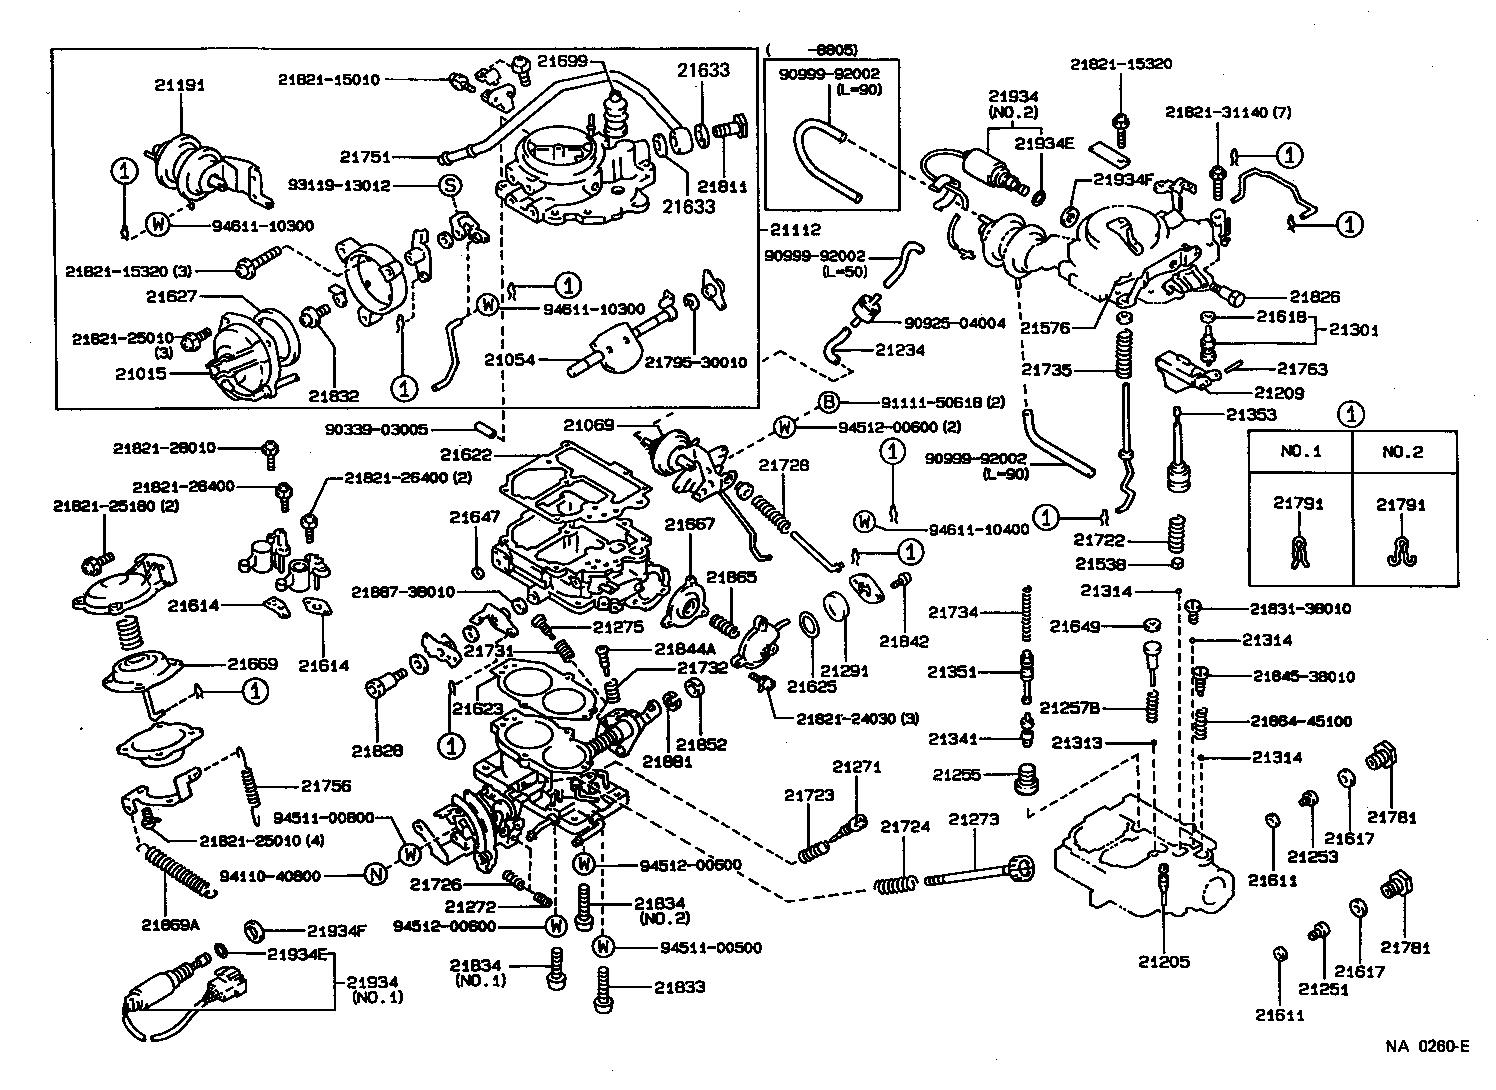 1989 toyota corolla engine diagram - wiring ddiagrams home host-copy -  host-copy.brixiaproart.it  brixia pro art